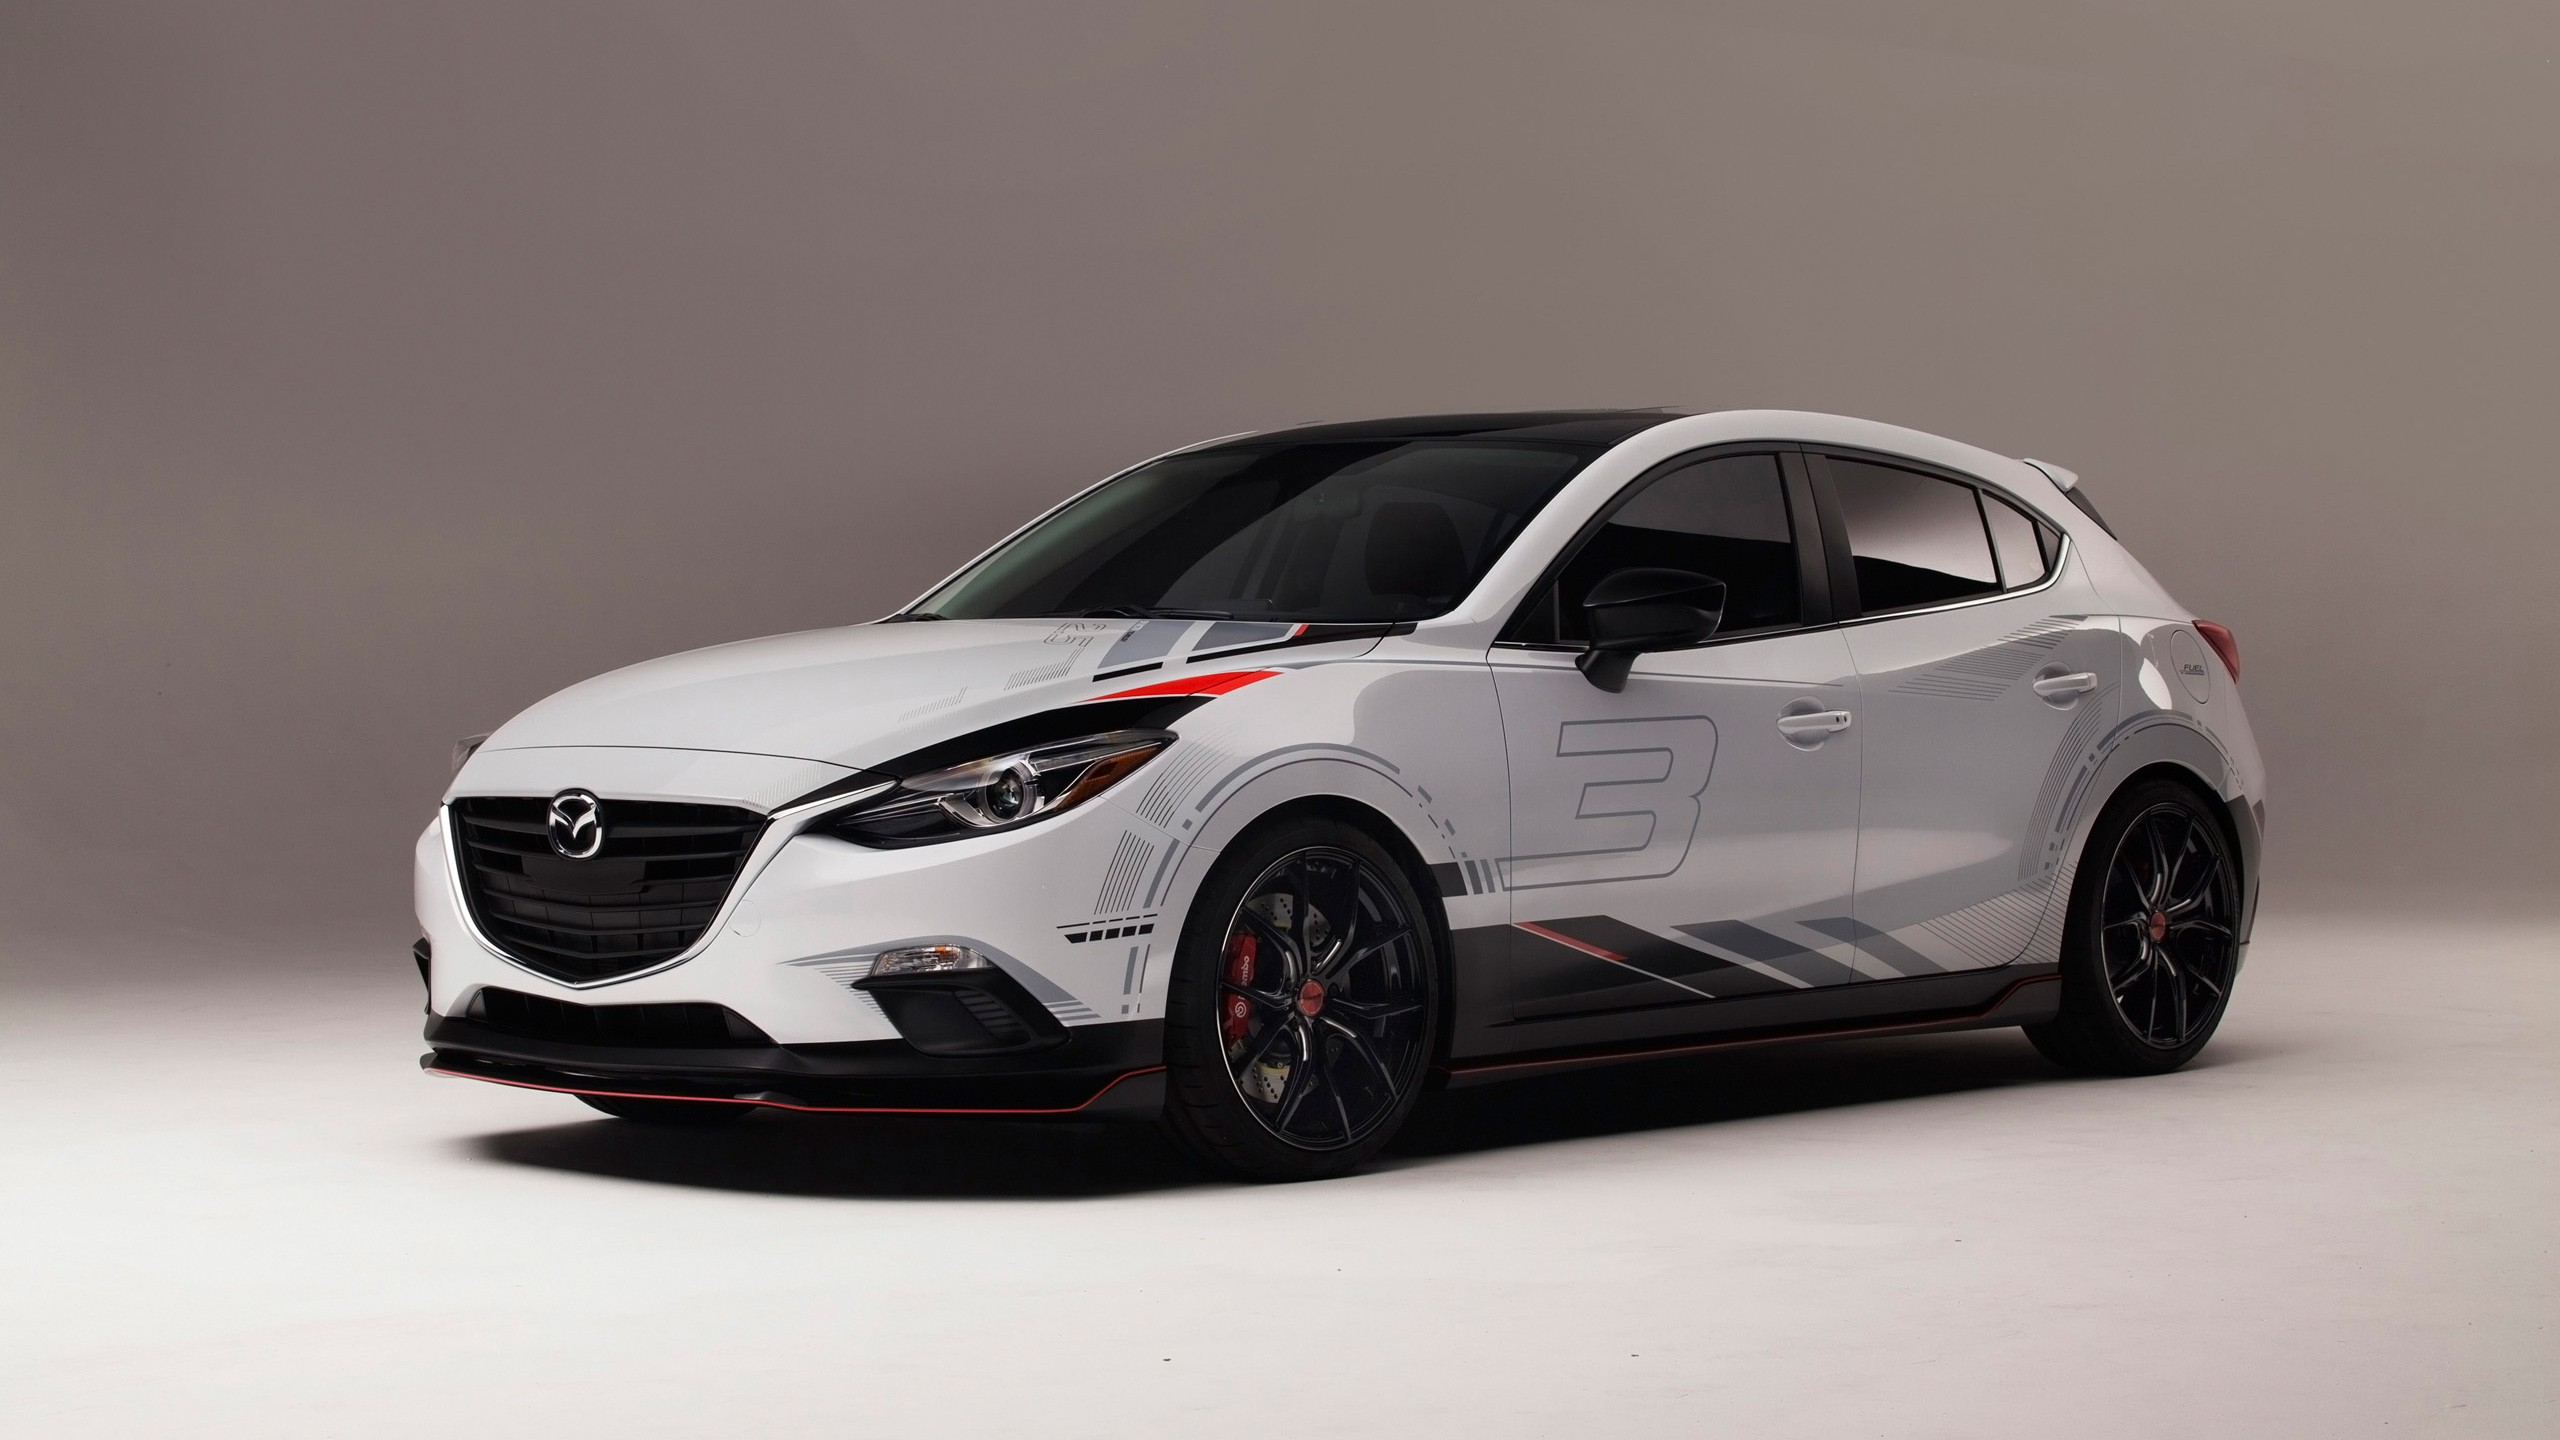 Mazda 3 2014 Hatchback White >> 2013 Mazda Club Sport 3 Wallpaper | HD Car Wallpapers | ID #3888